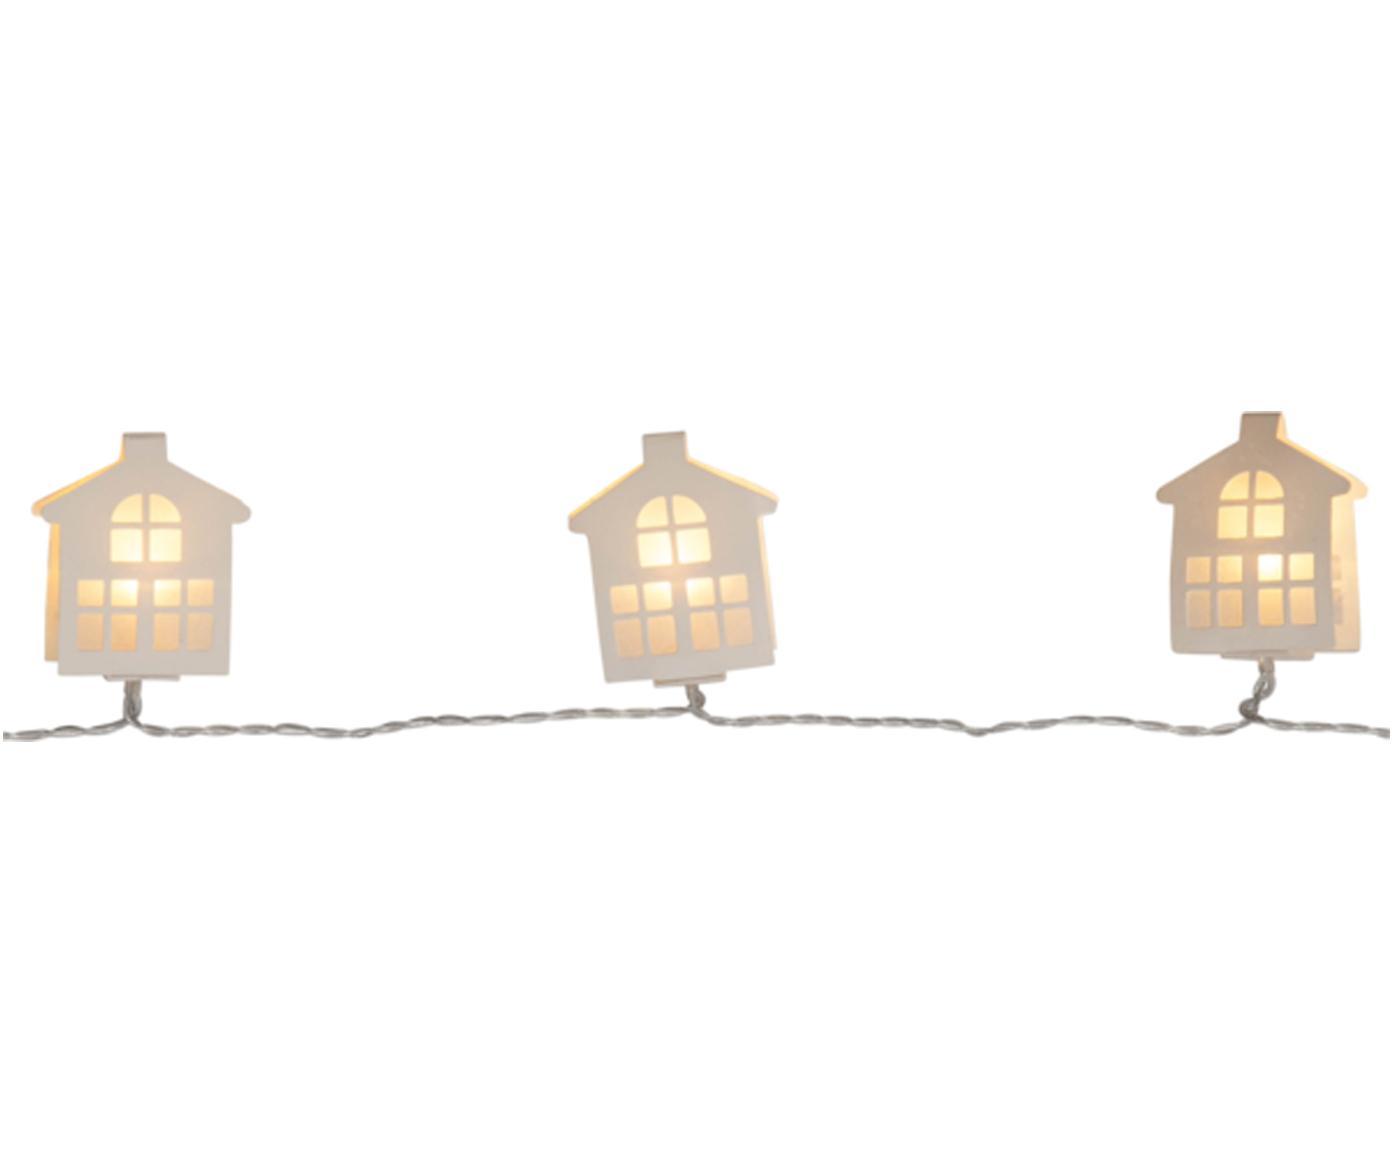 Ghirlanda a LED Paperwork, Lung. 225 cm, Lanterne: carta, Bianco, Lung. 225 cm